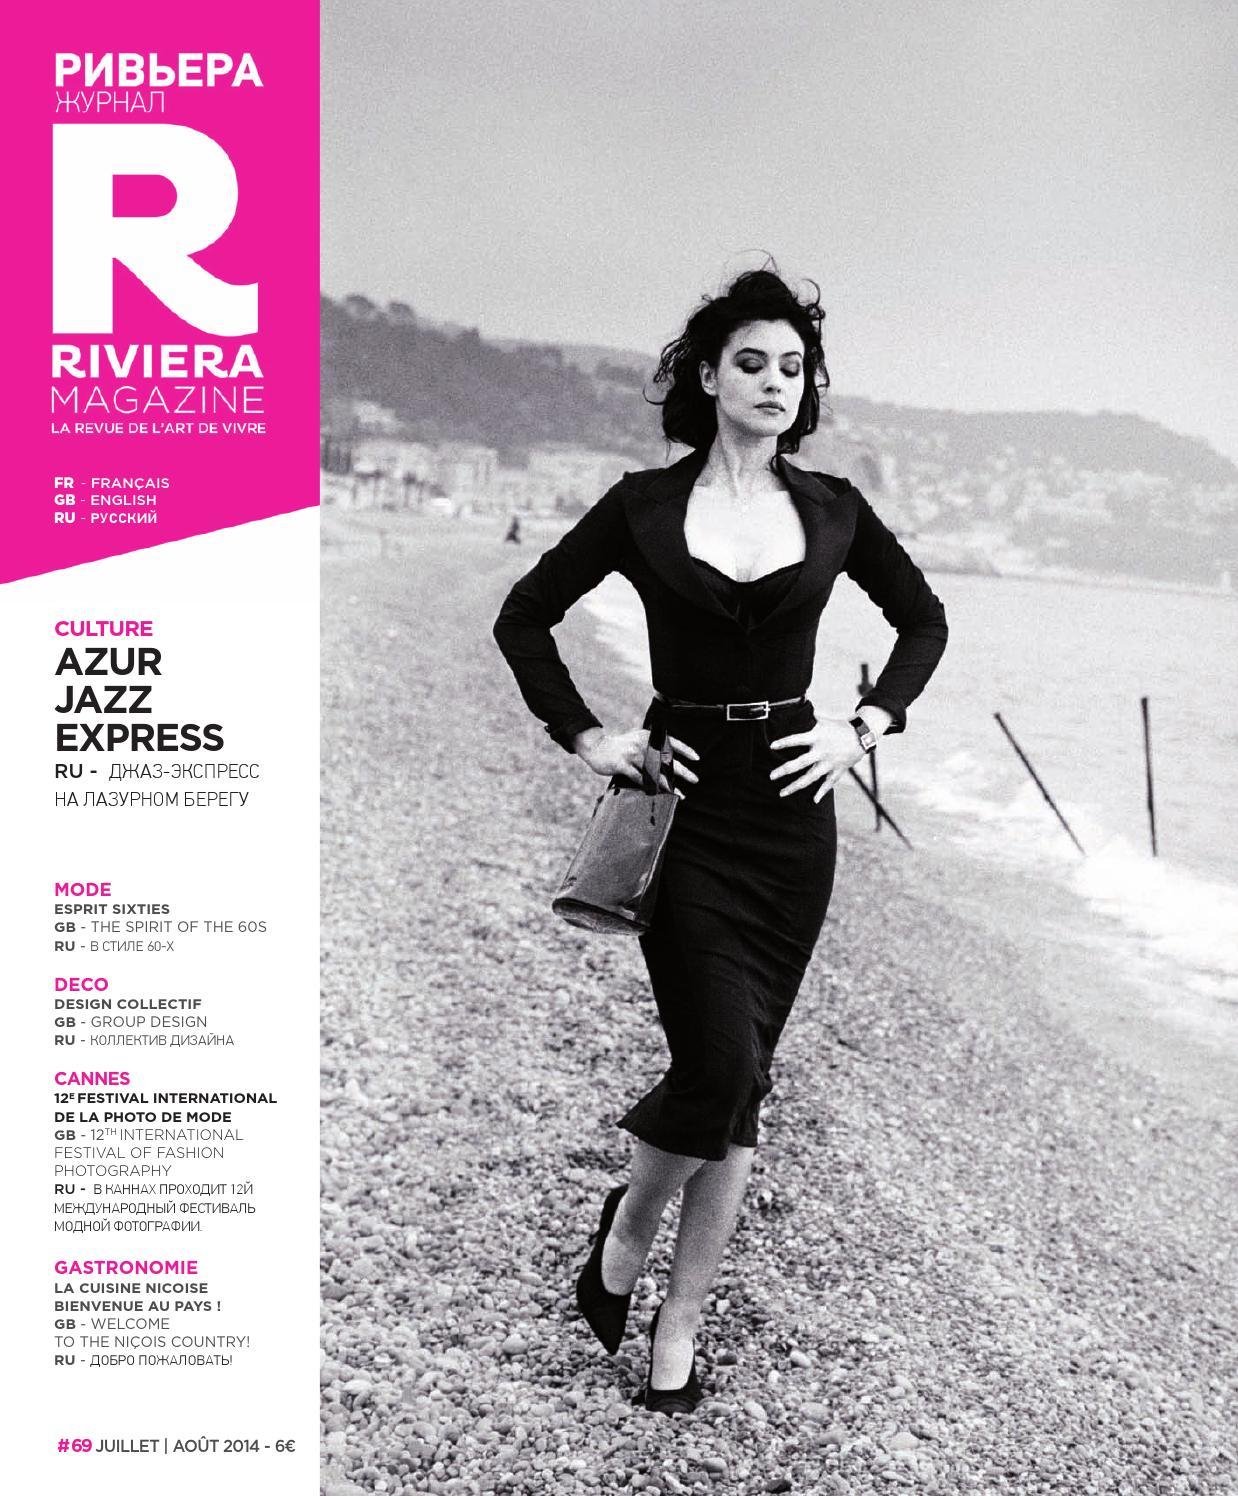 Riviera Magazine n°69 - juillet août 2014 by Riviera Magazine - issuu 53e5a275af1